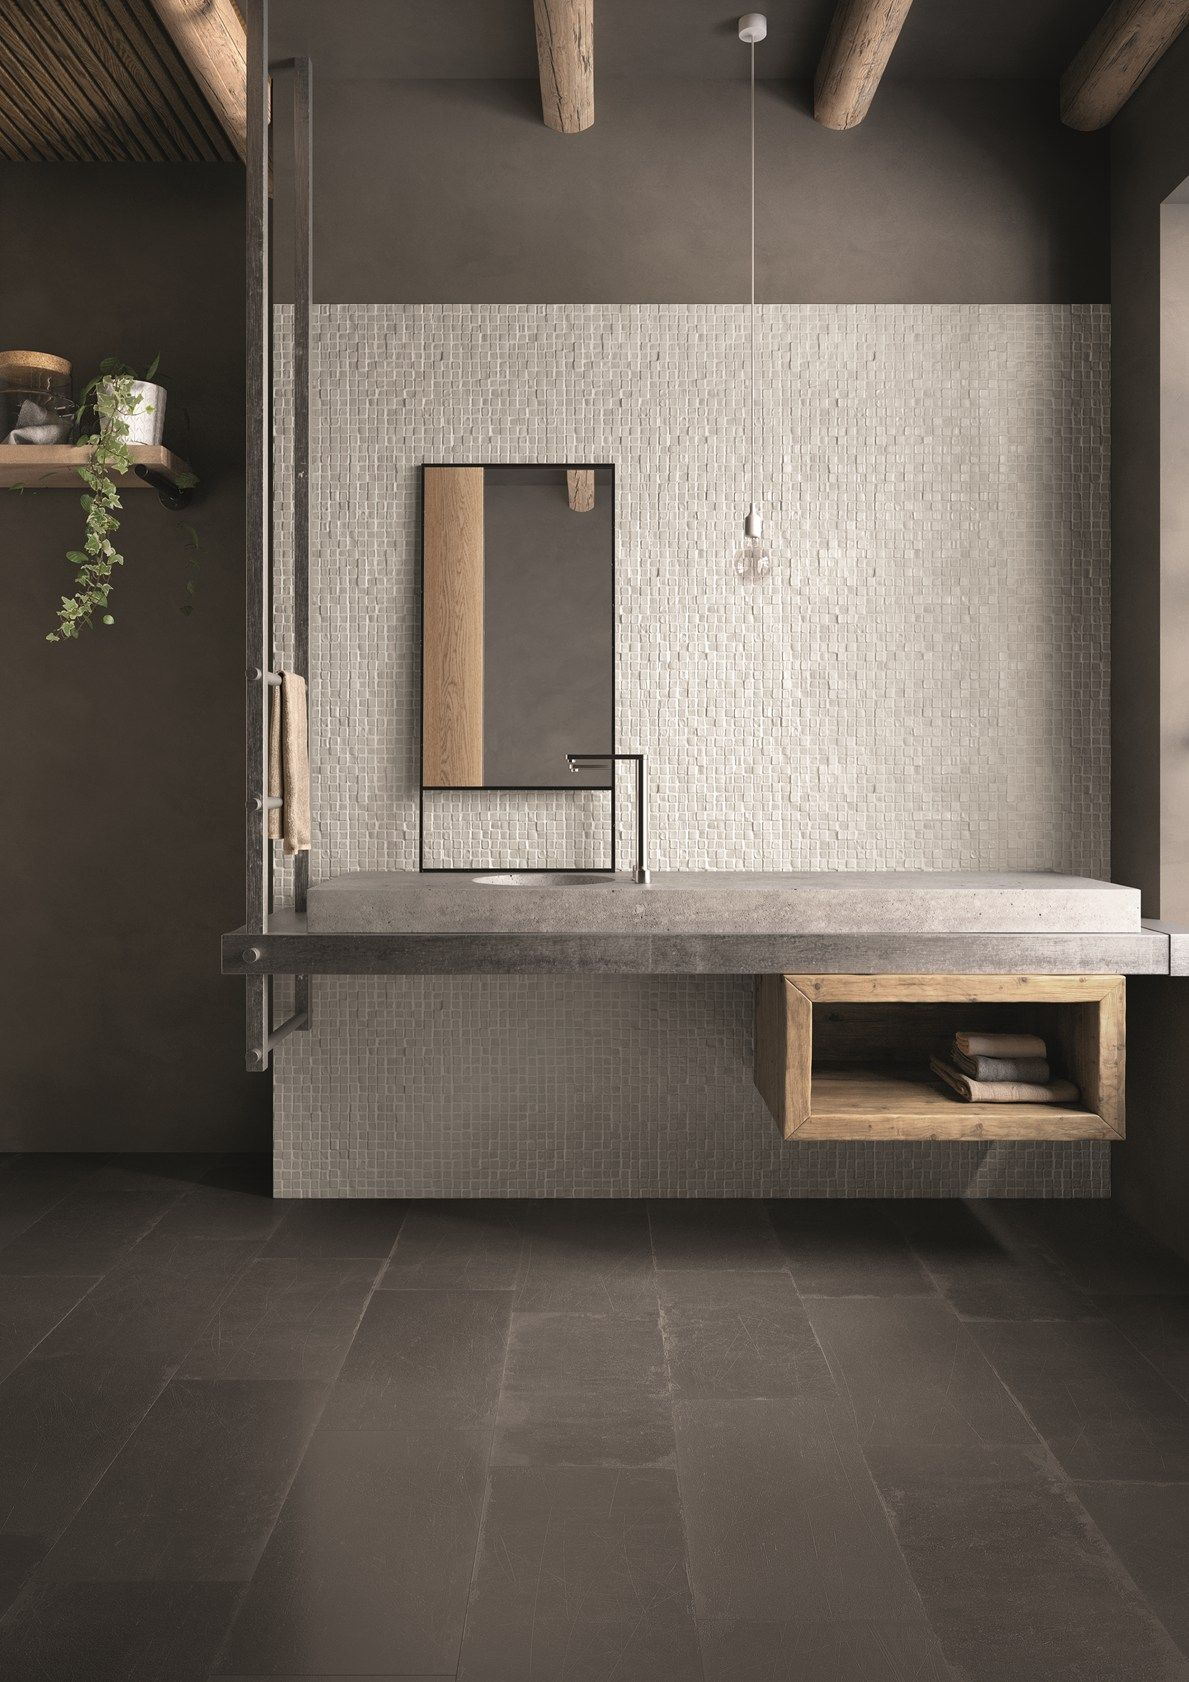 L H Collection By Viva Architecture Bathroom Bathroom Decor Bathrooms Remodel